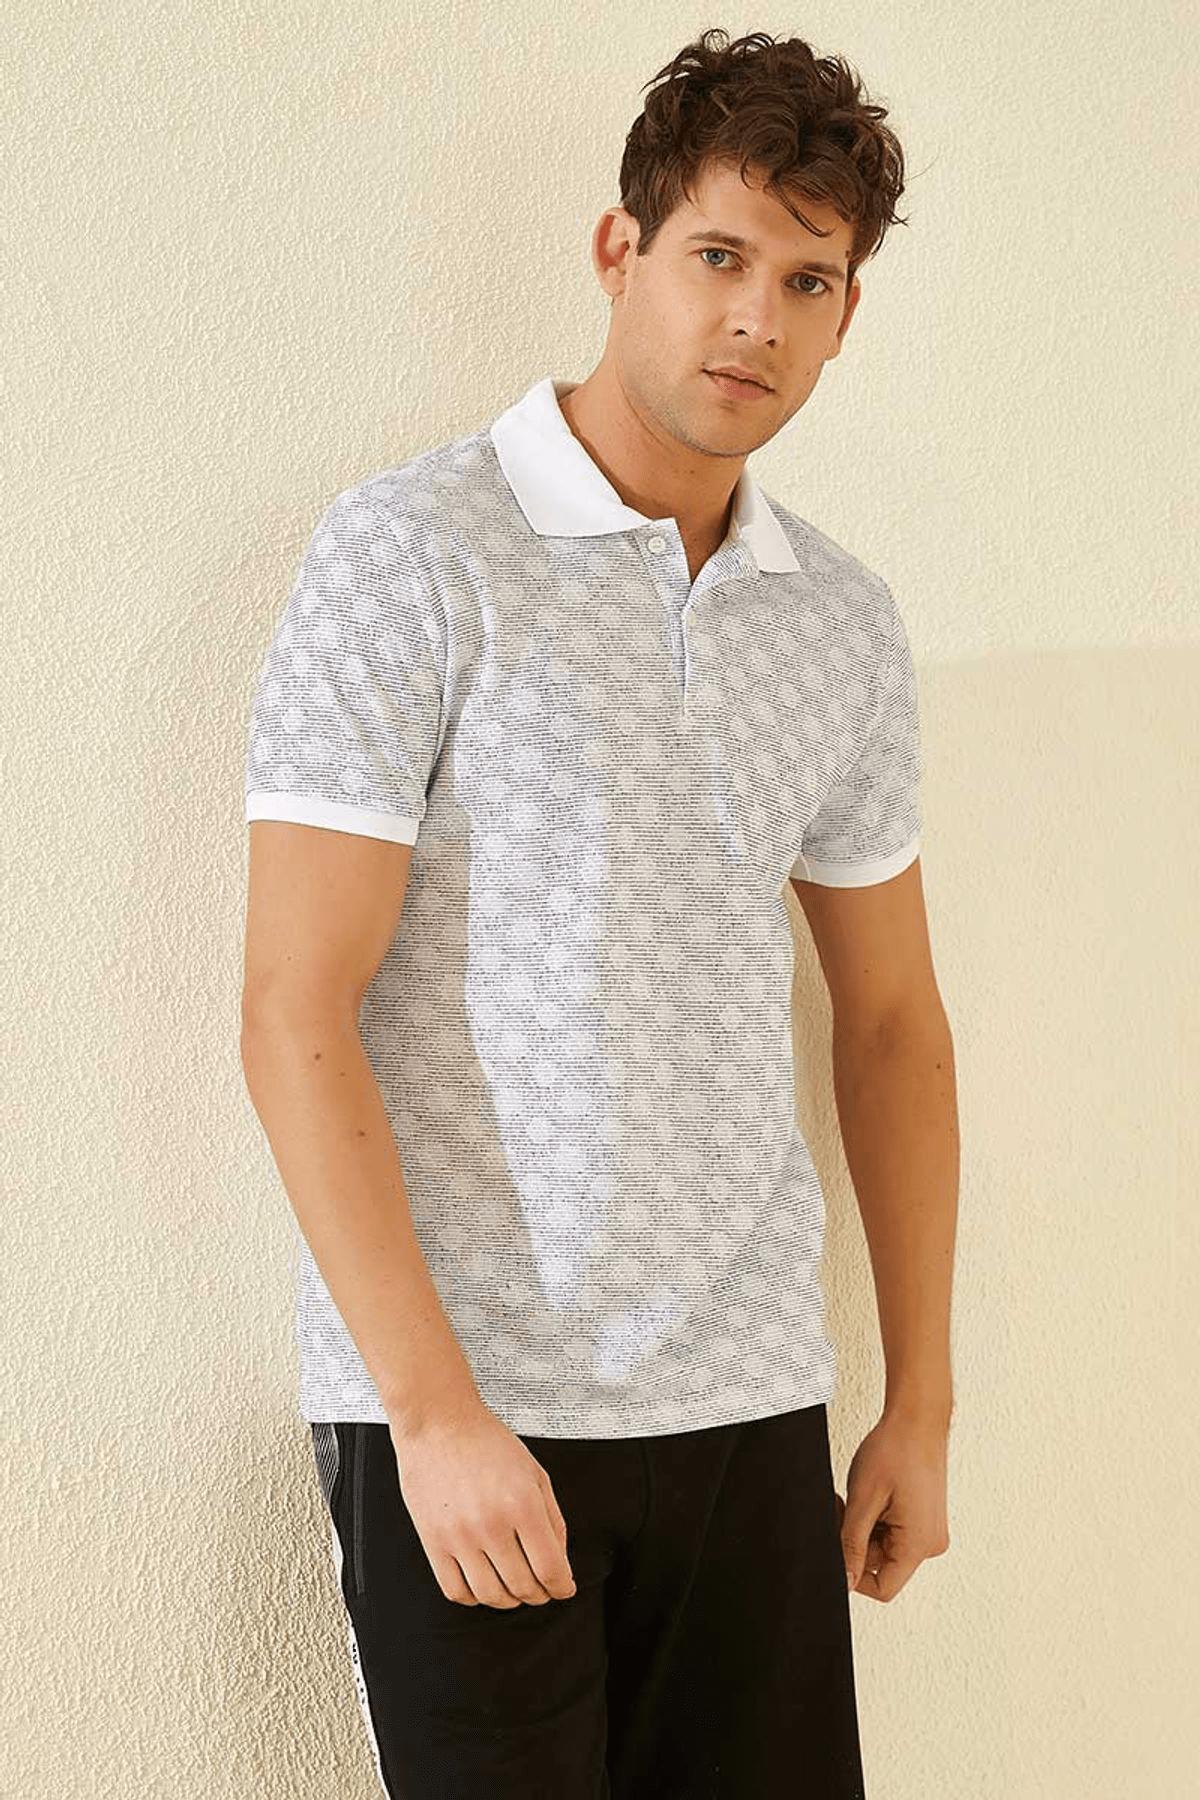 Tommy Life Baskılı Polo Yaka Beyaz Erkek T-Shirt T08ER-87796_1 4